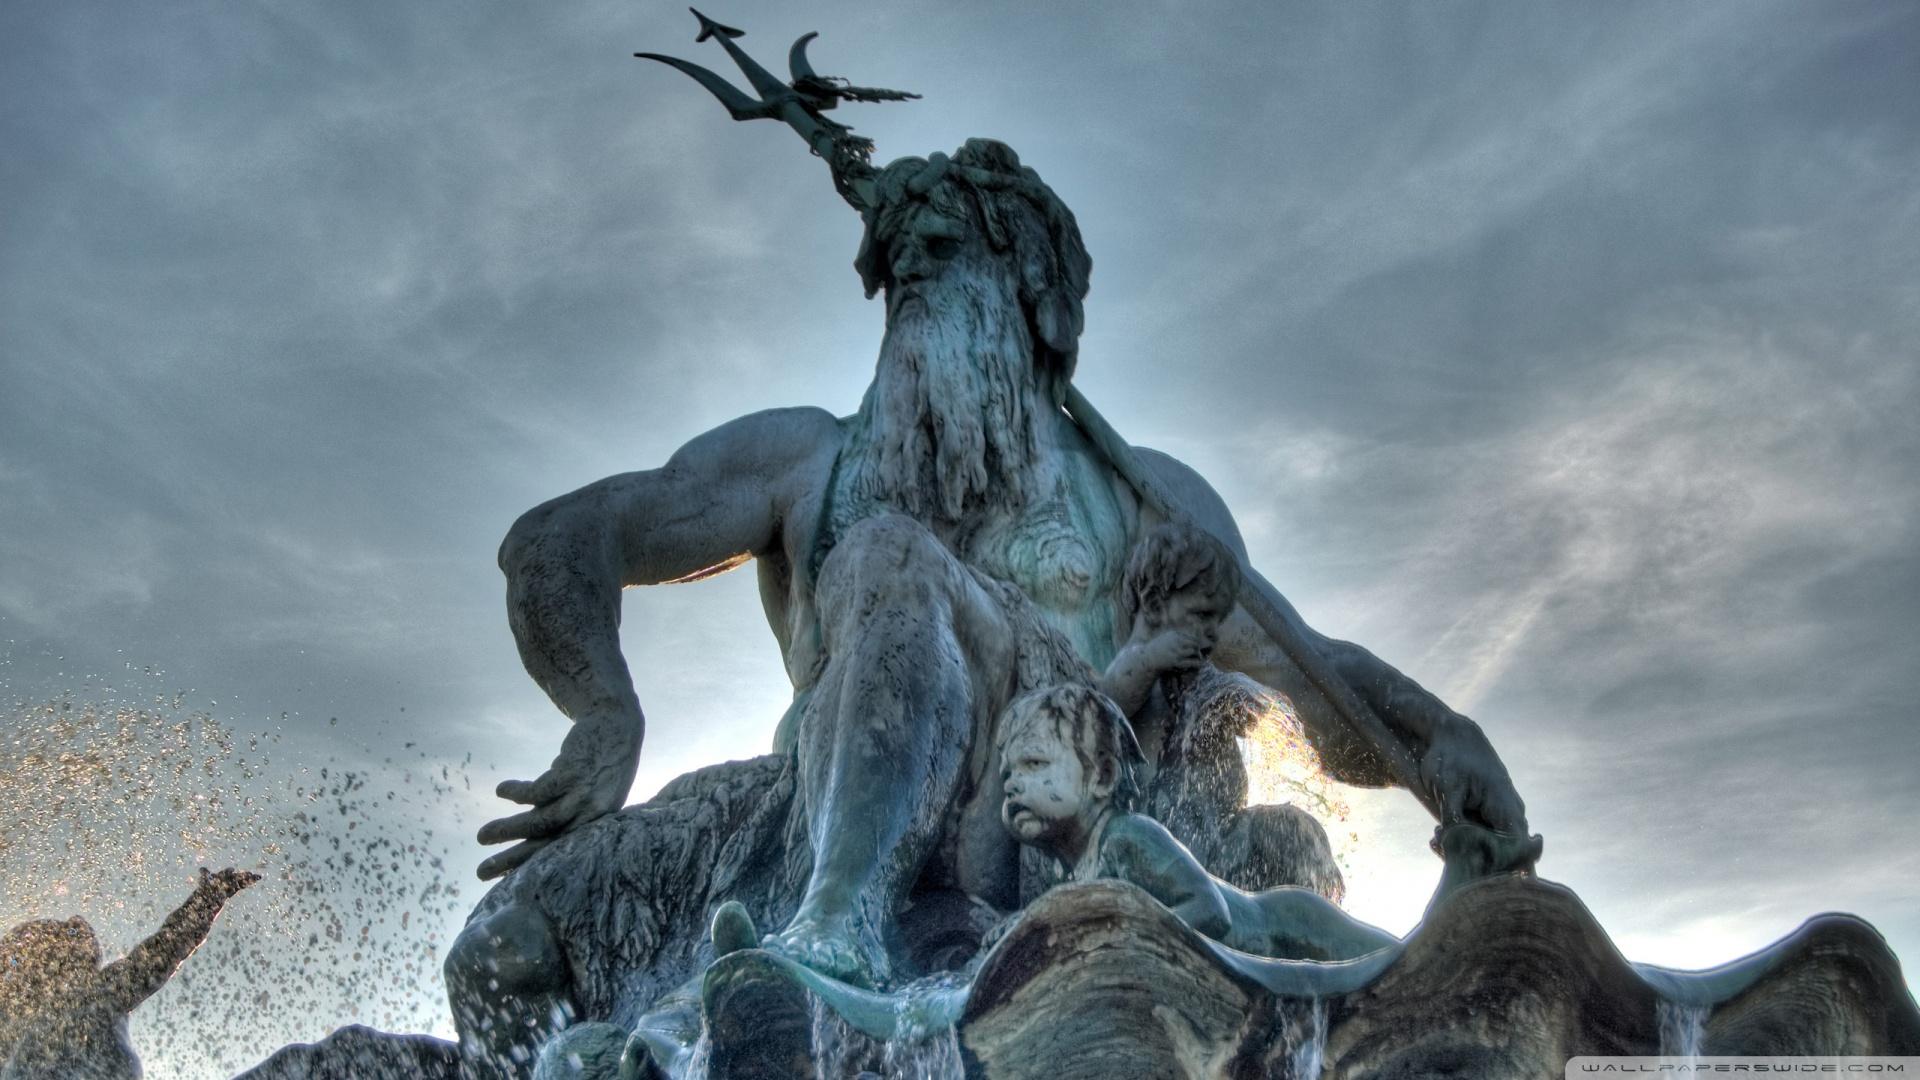 Poseidon Statue Wallpaper Statue of neptune in the vatican museum city 1920x1080